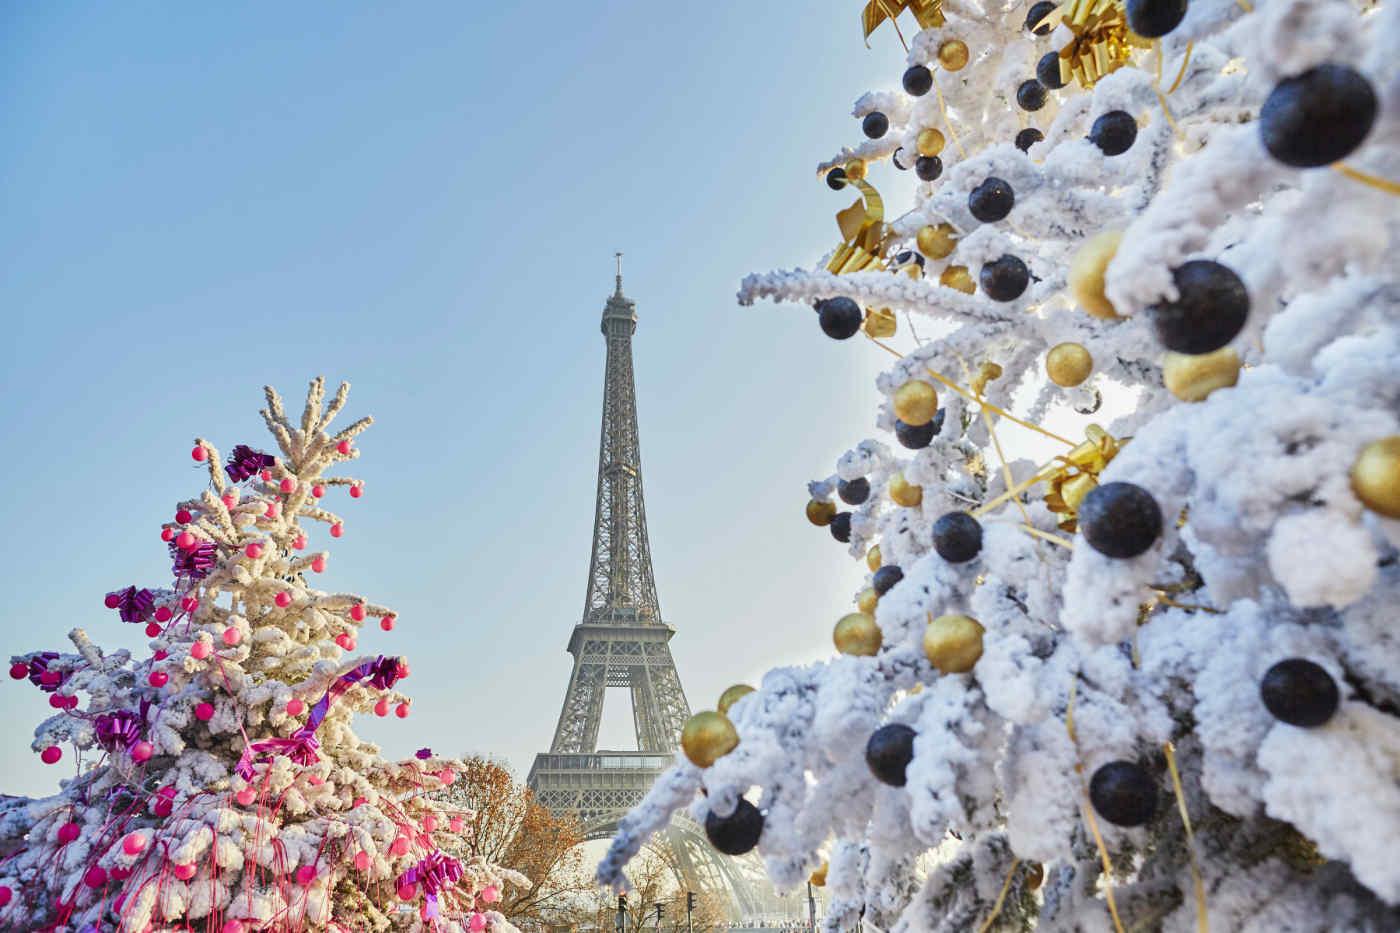 Eiffel Tower • Paris, France